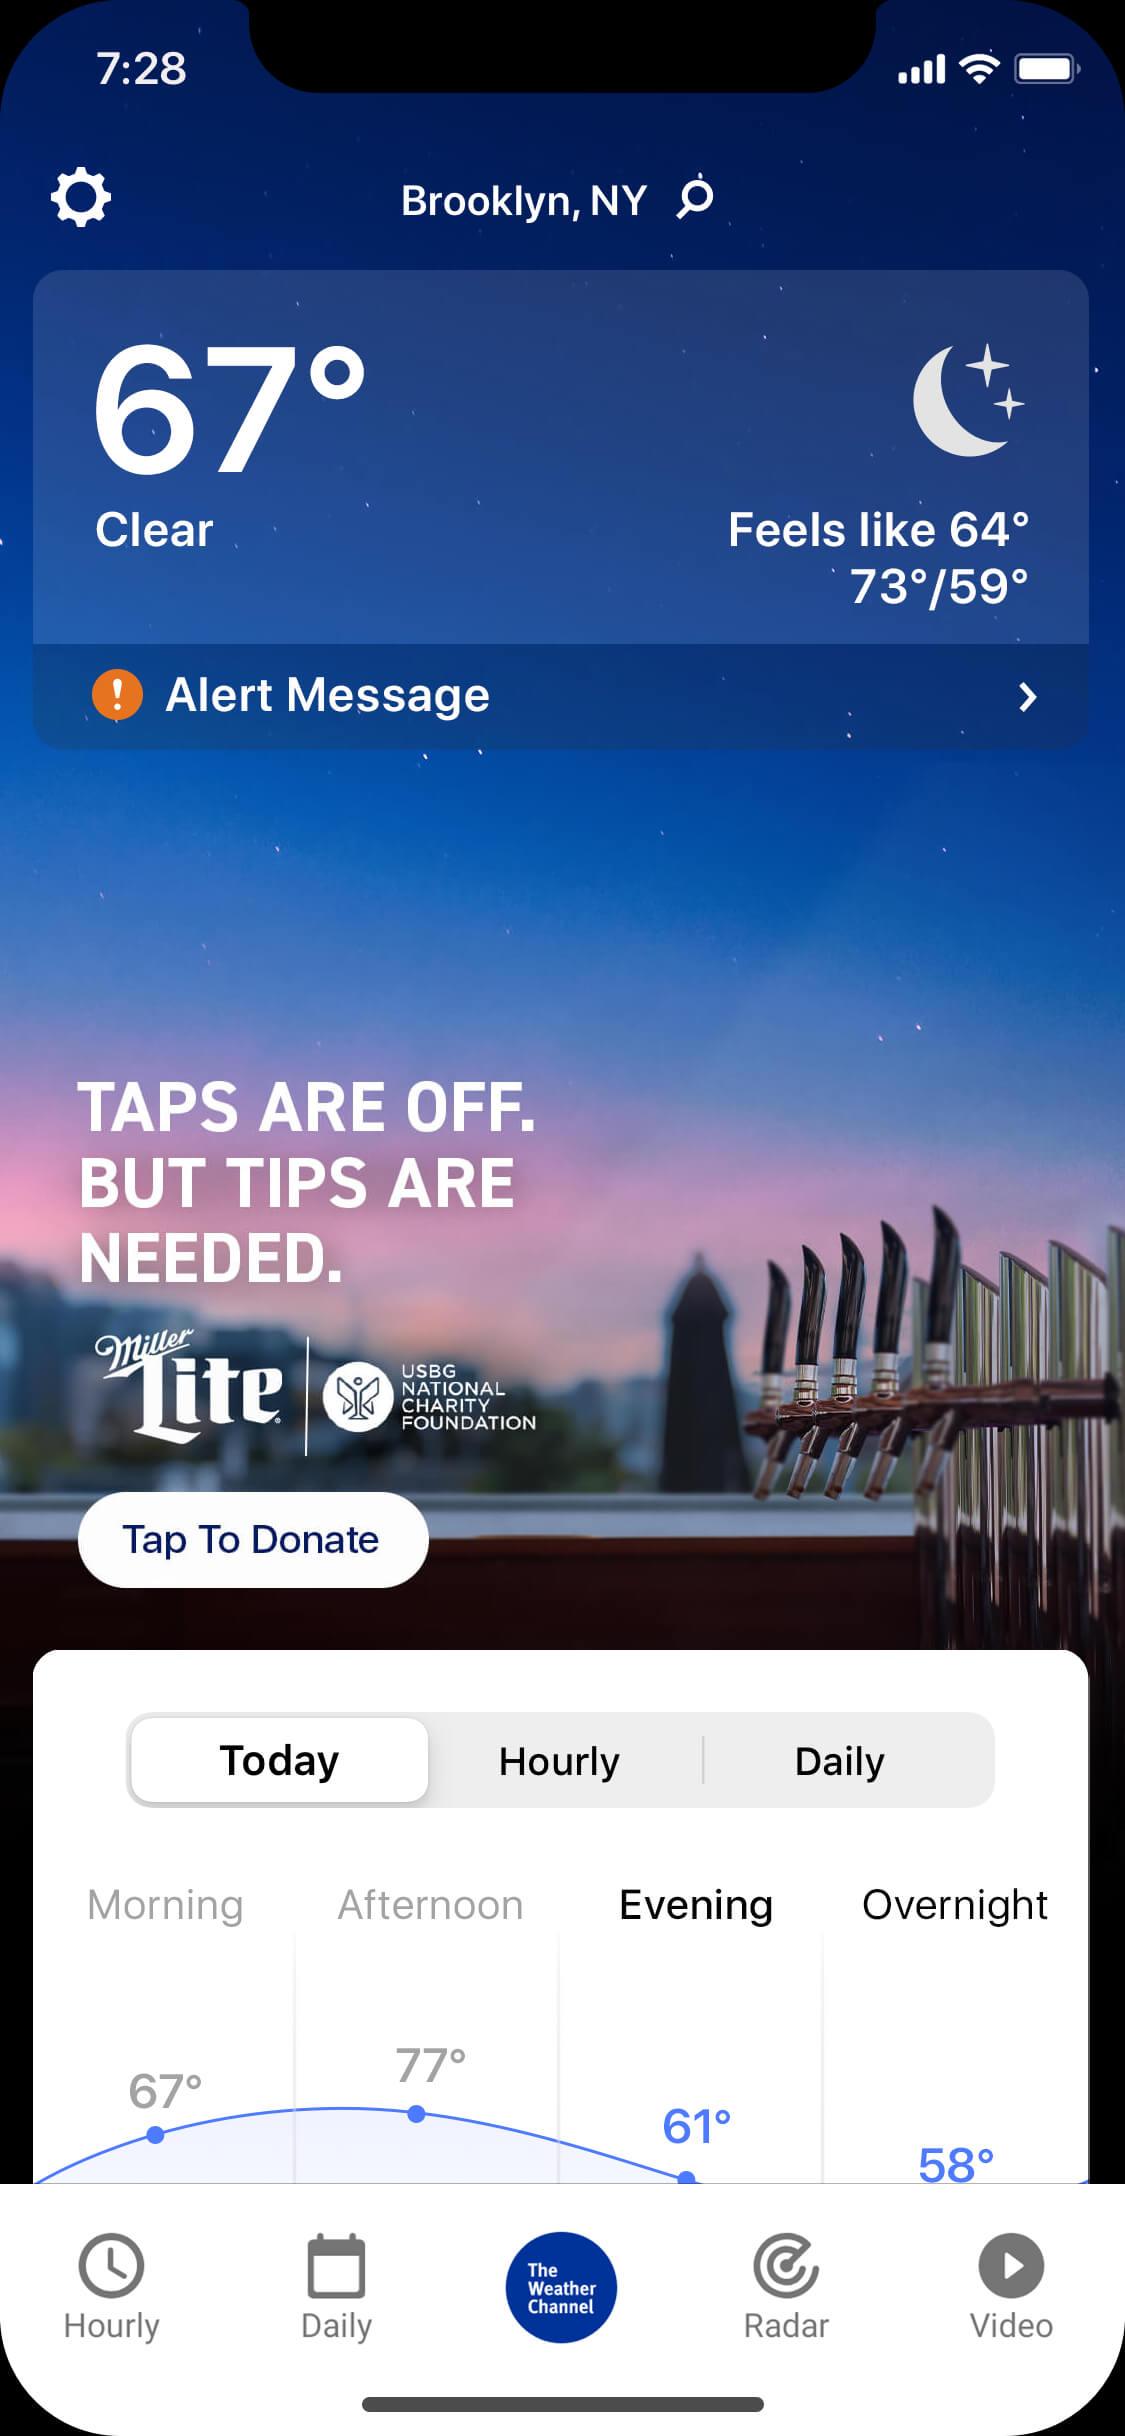 MillerLite_Mobile_App-IM_clear_night